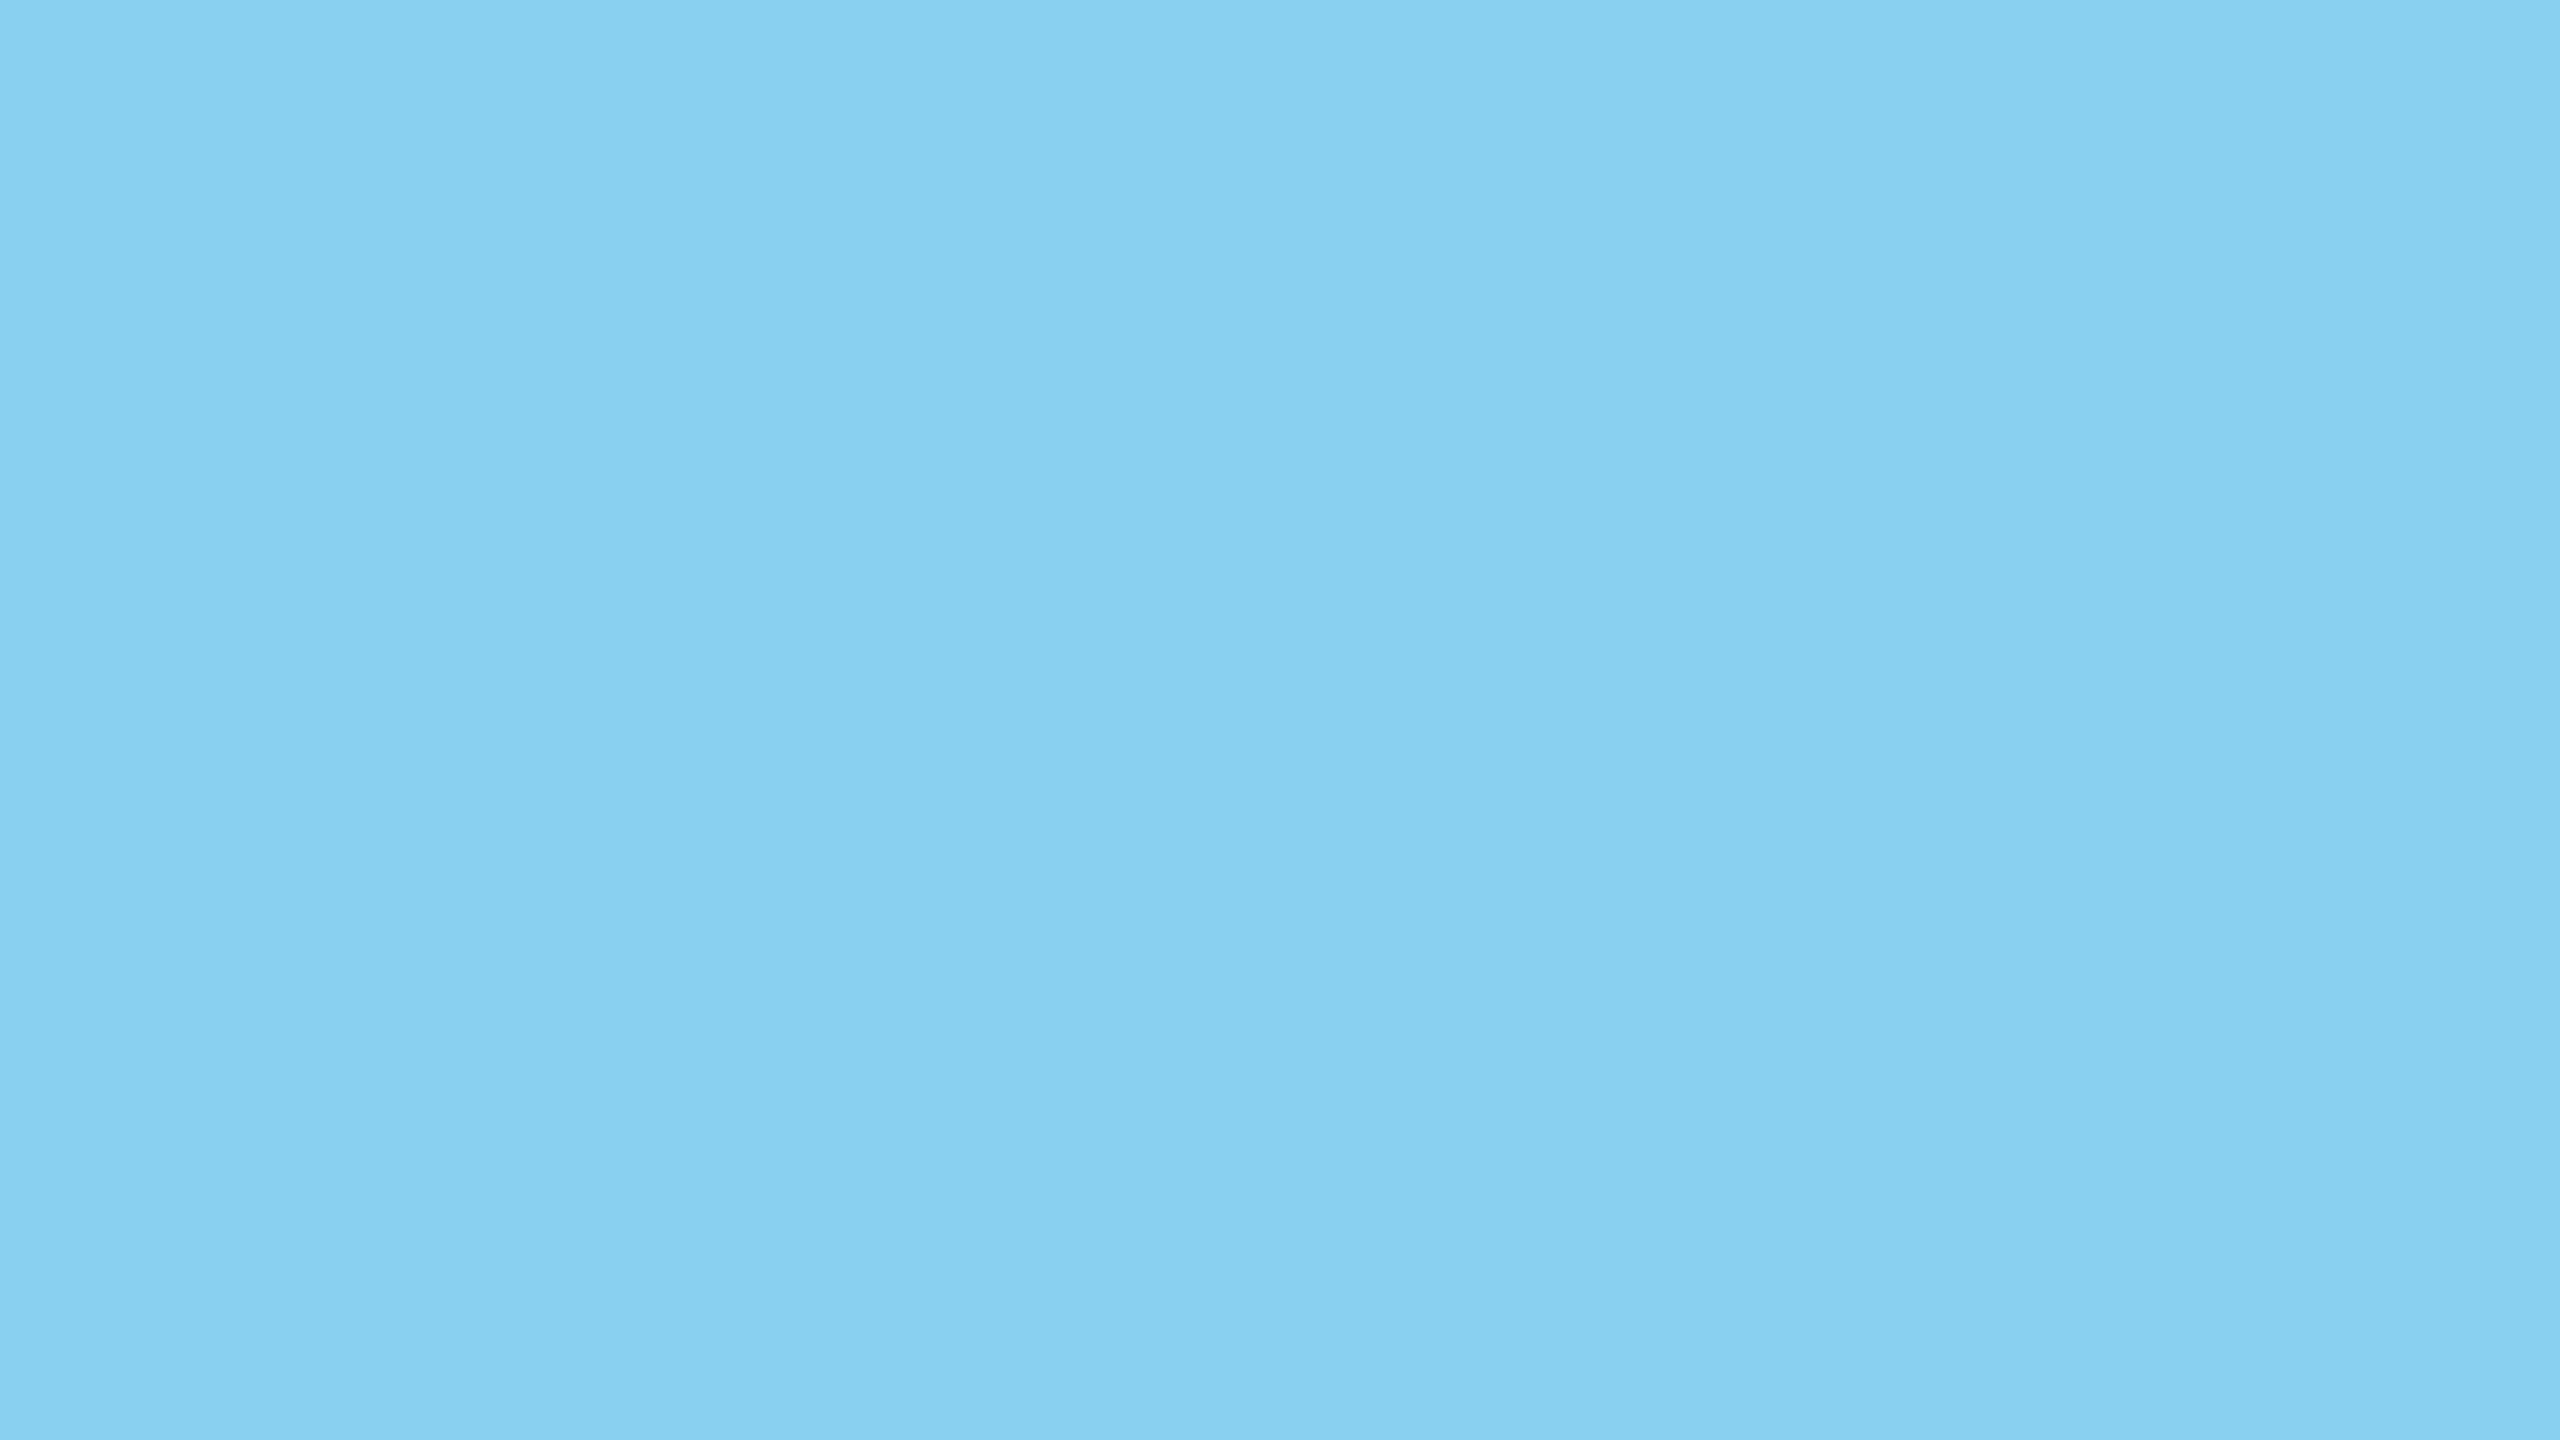 Solid Blue Background Wallpaper (61+ images)